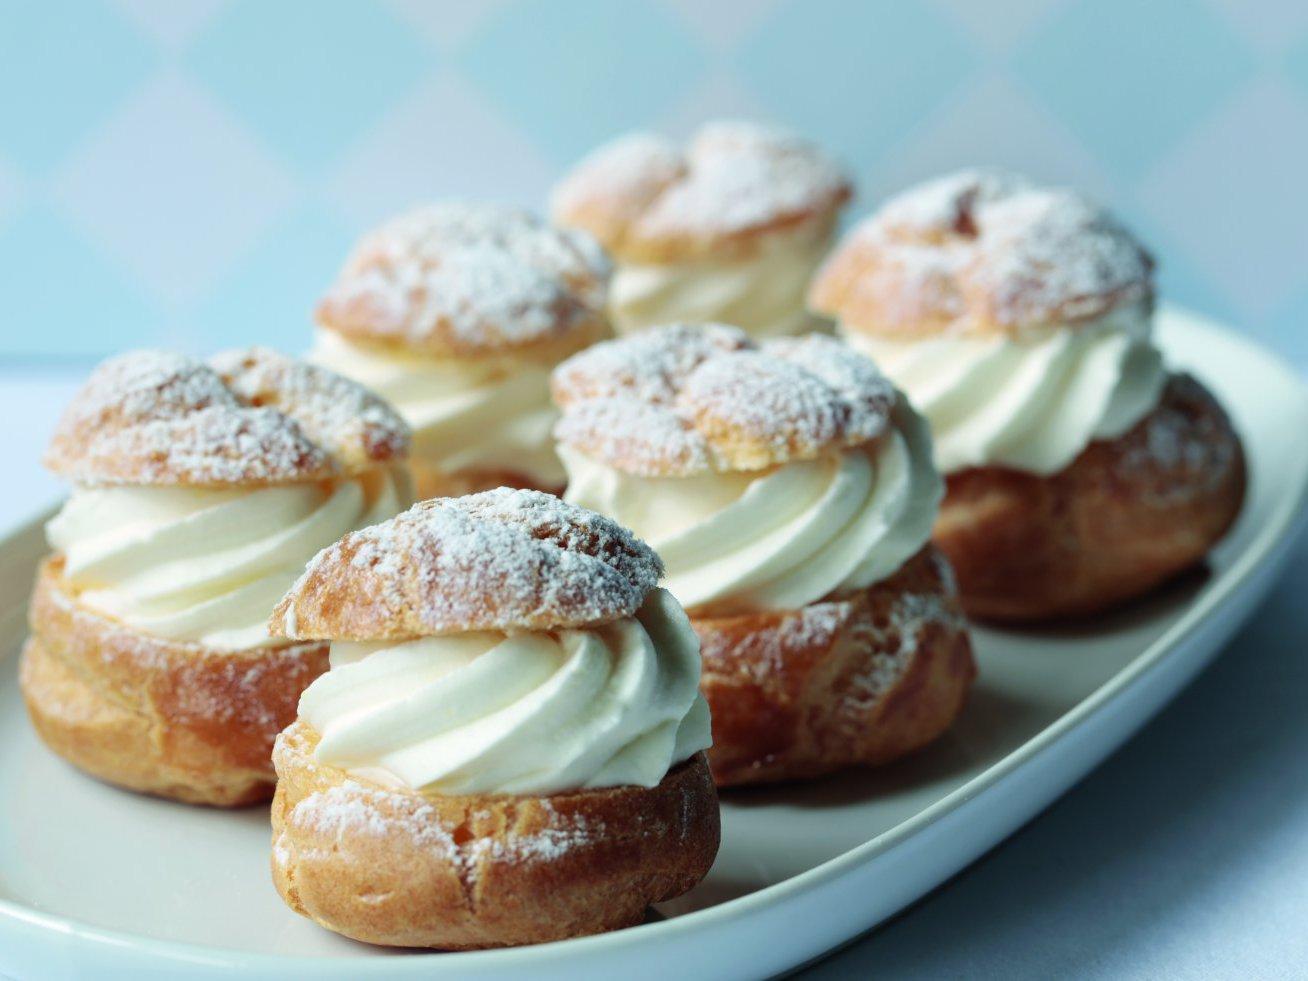 Course Image FIG513-0000-2020-1-Desserts 1